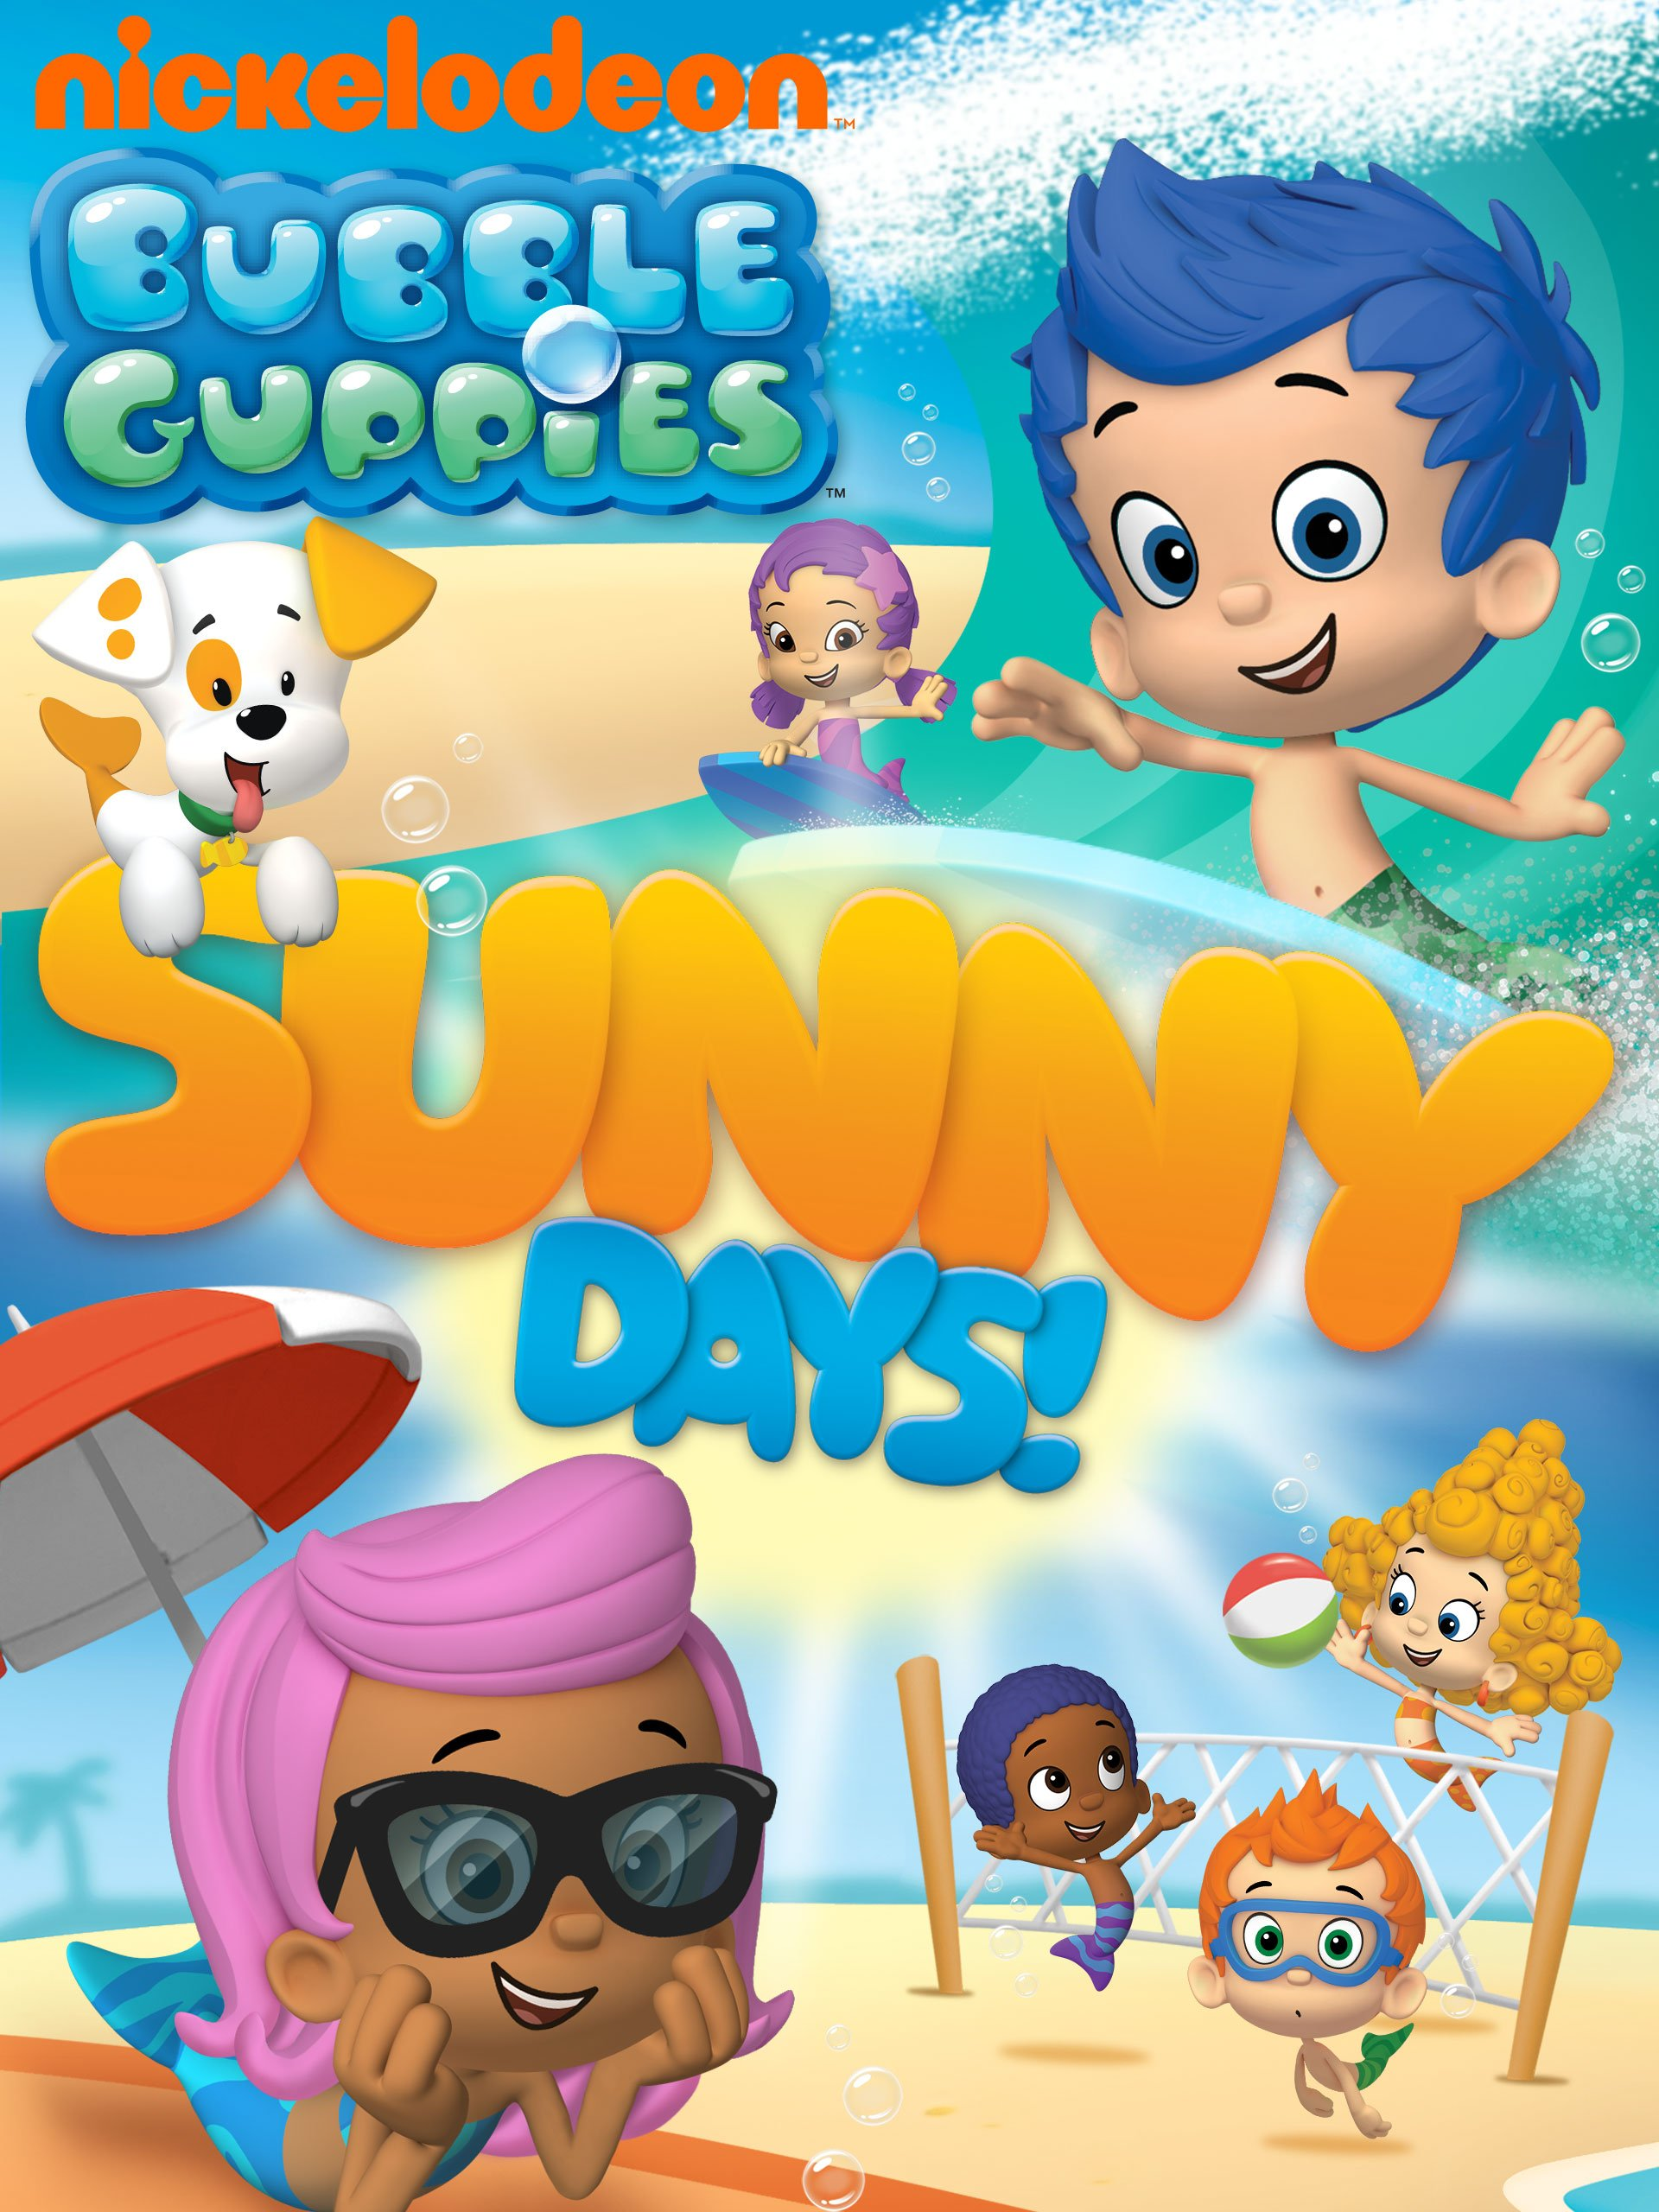 Bubble guppies character rental - Amazon Com Bubble Guppies Sunny Days Brianna Gentilella Zachary Gordon Jelani Imani Tino Insana Amazon Digital Services Llc